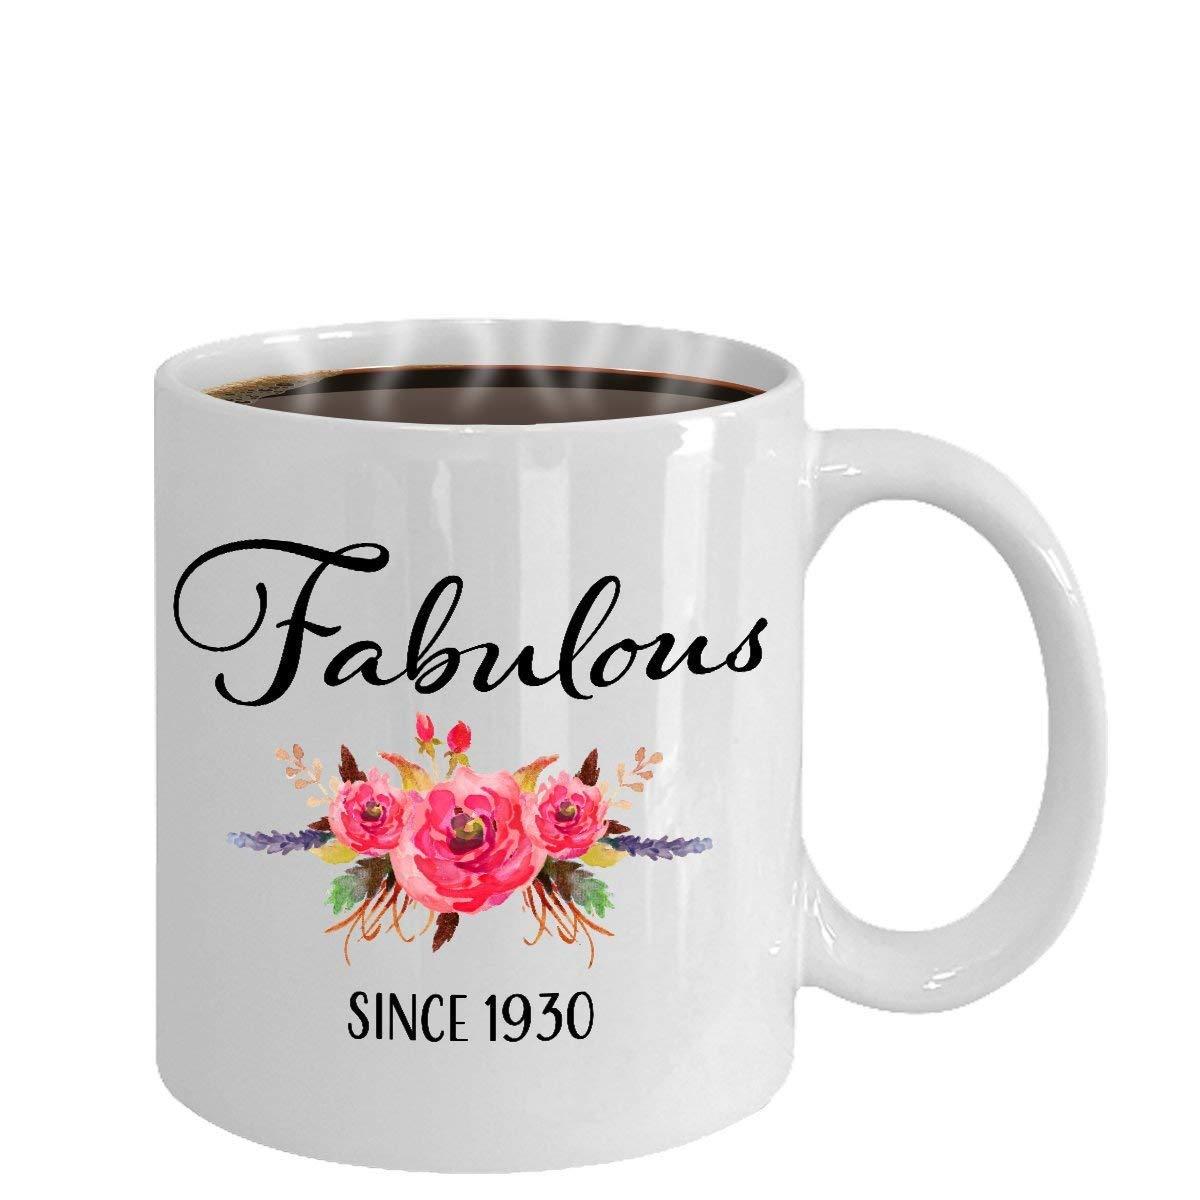 Amazon 88th Birthday Ideas 88 Year Old Woman Gifts For Women Her Fabulous Since 1930 Mug Coffee Tea Cup Yr